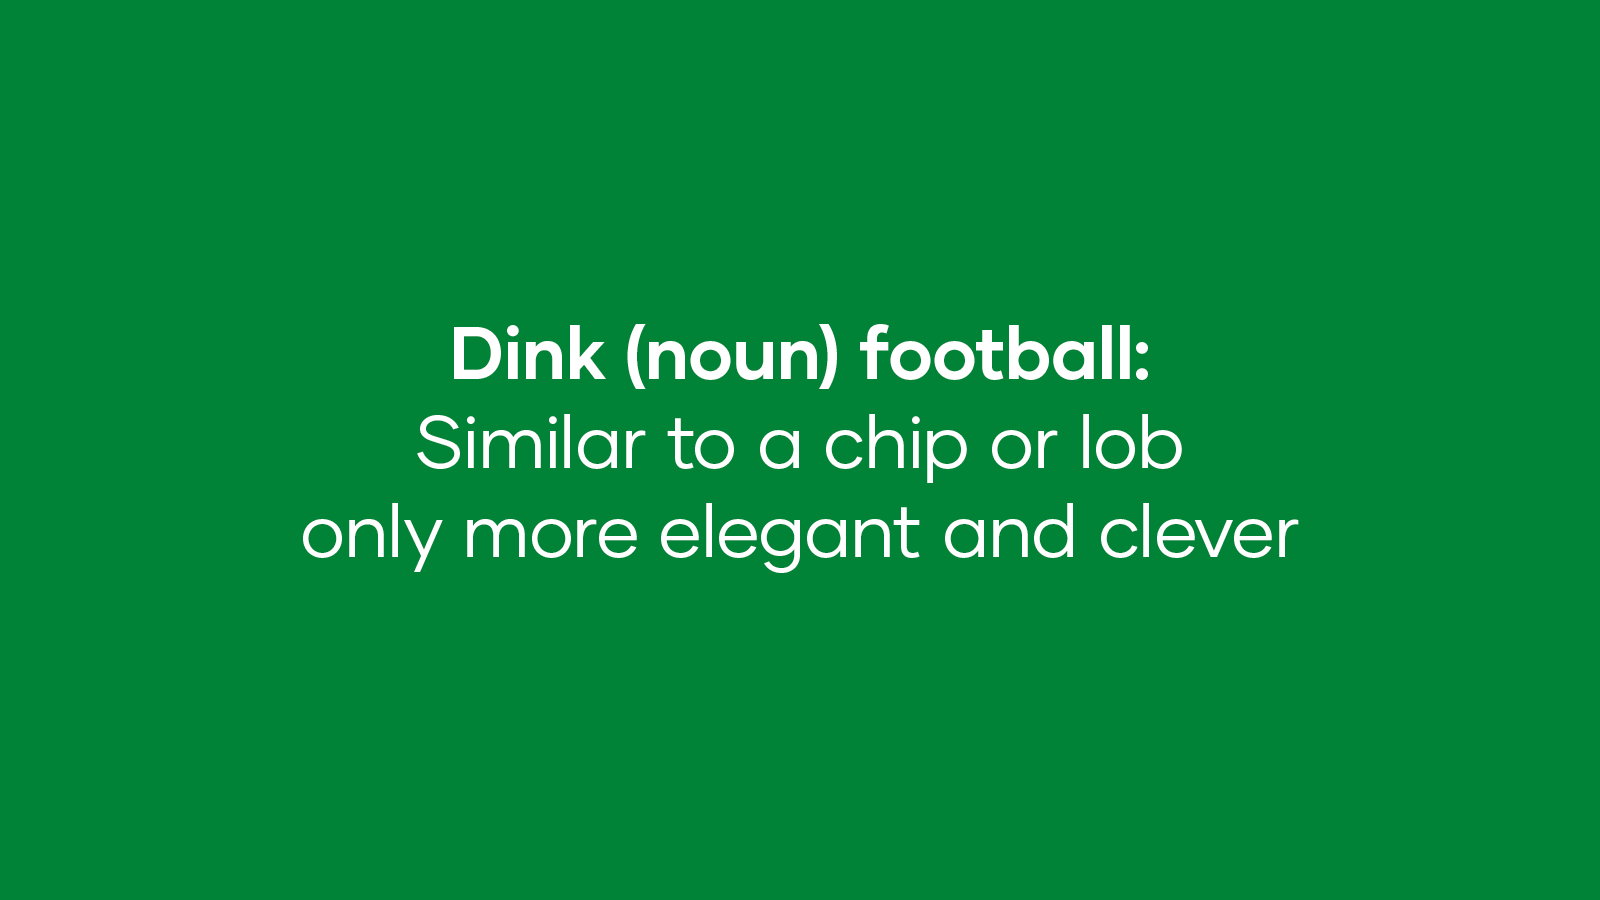 branding-identity-design-sport-football-graphics-dinkit-artwork-prints-posters-gallery-milton-keynes-london-14